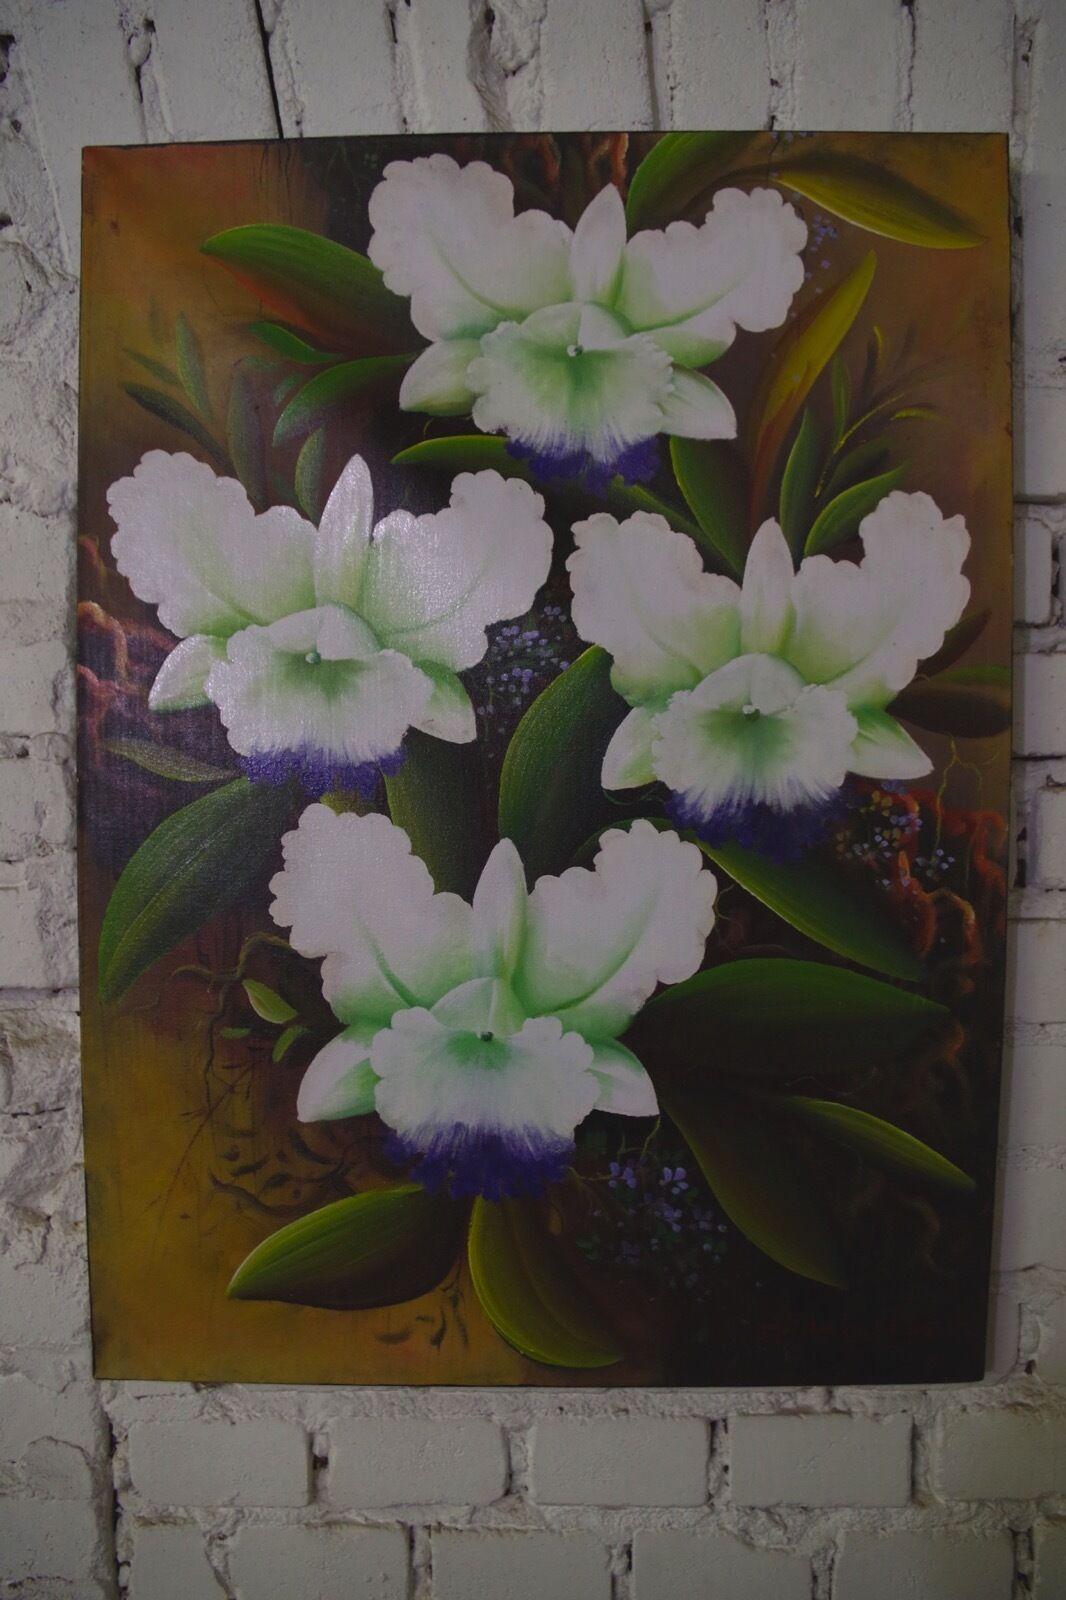 Peinture mur image huile à la main main main Bali fleurs vintage jungle 76x55cm eab64e